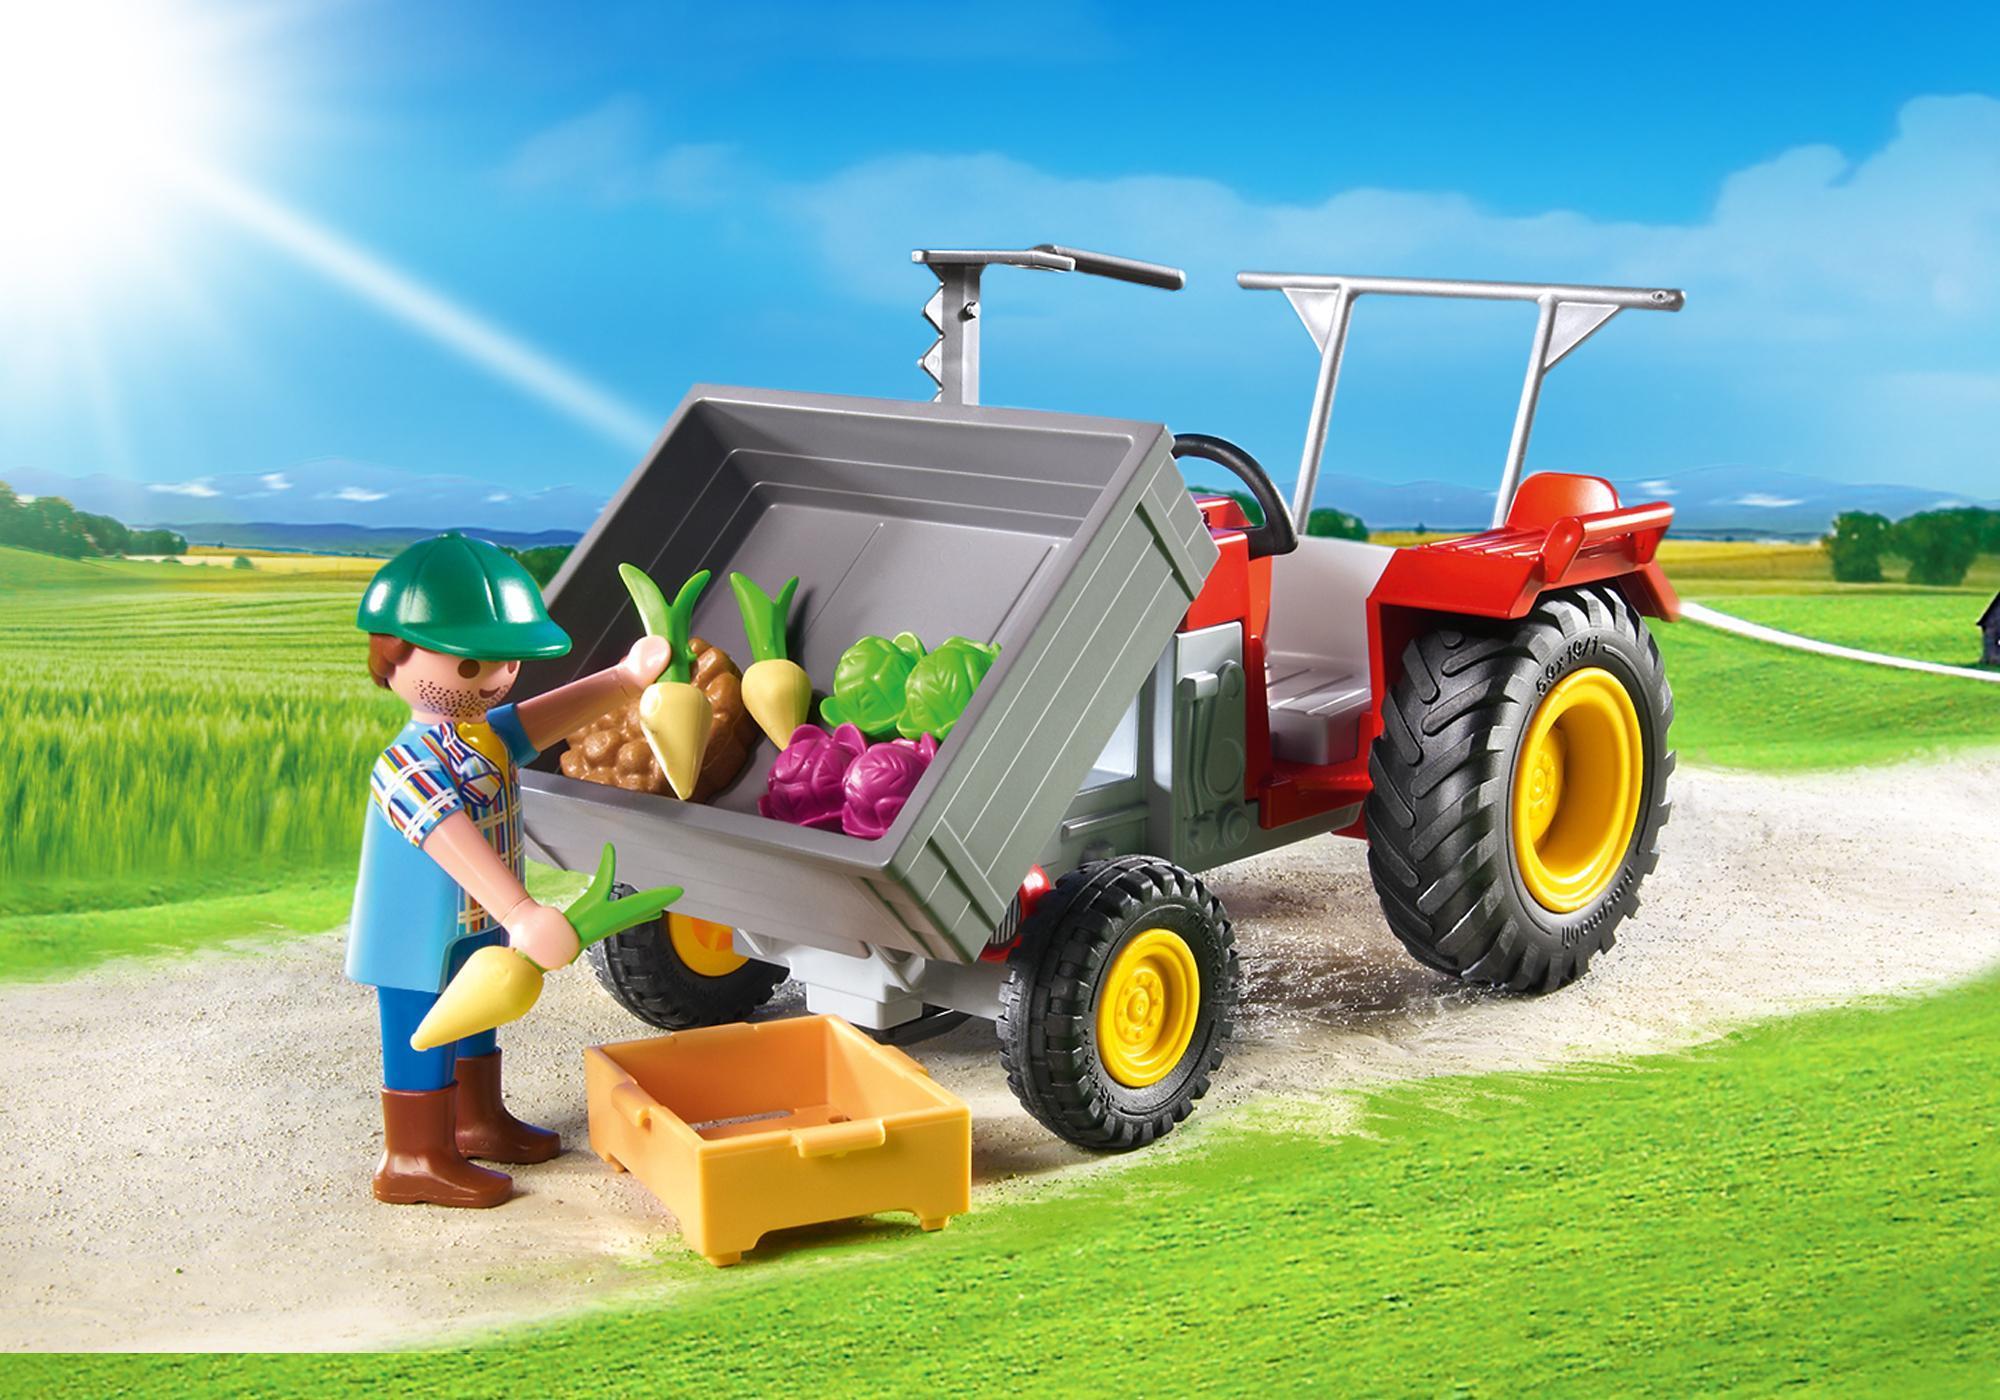 http://media.playmobil.com/i/playmobil/6131_product_extra1